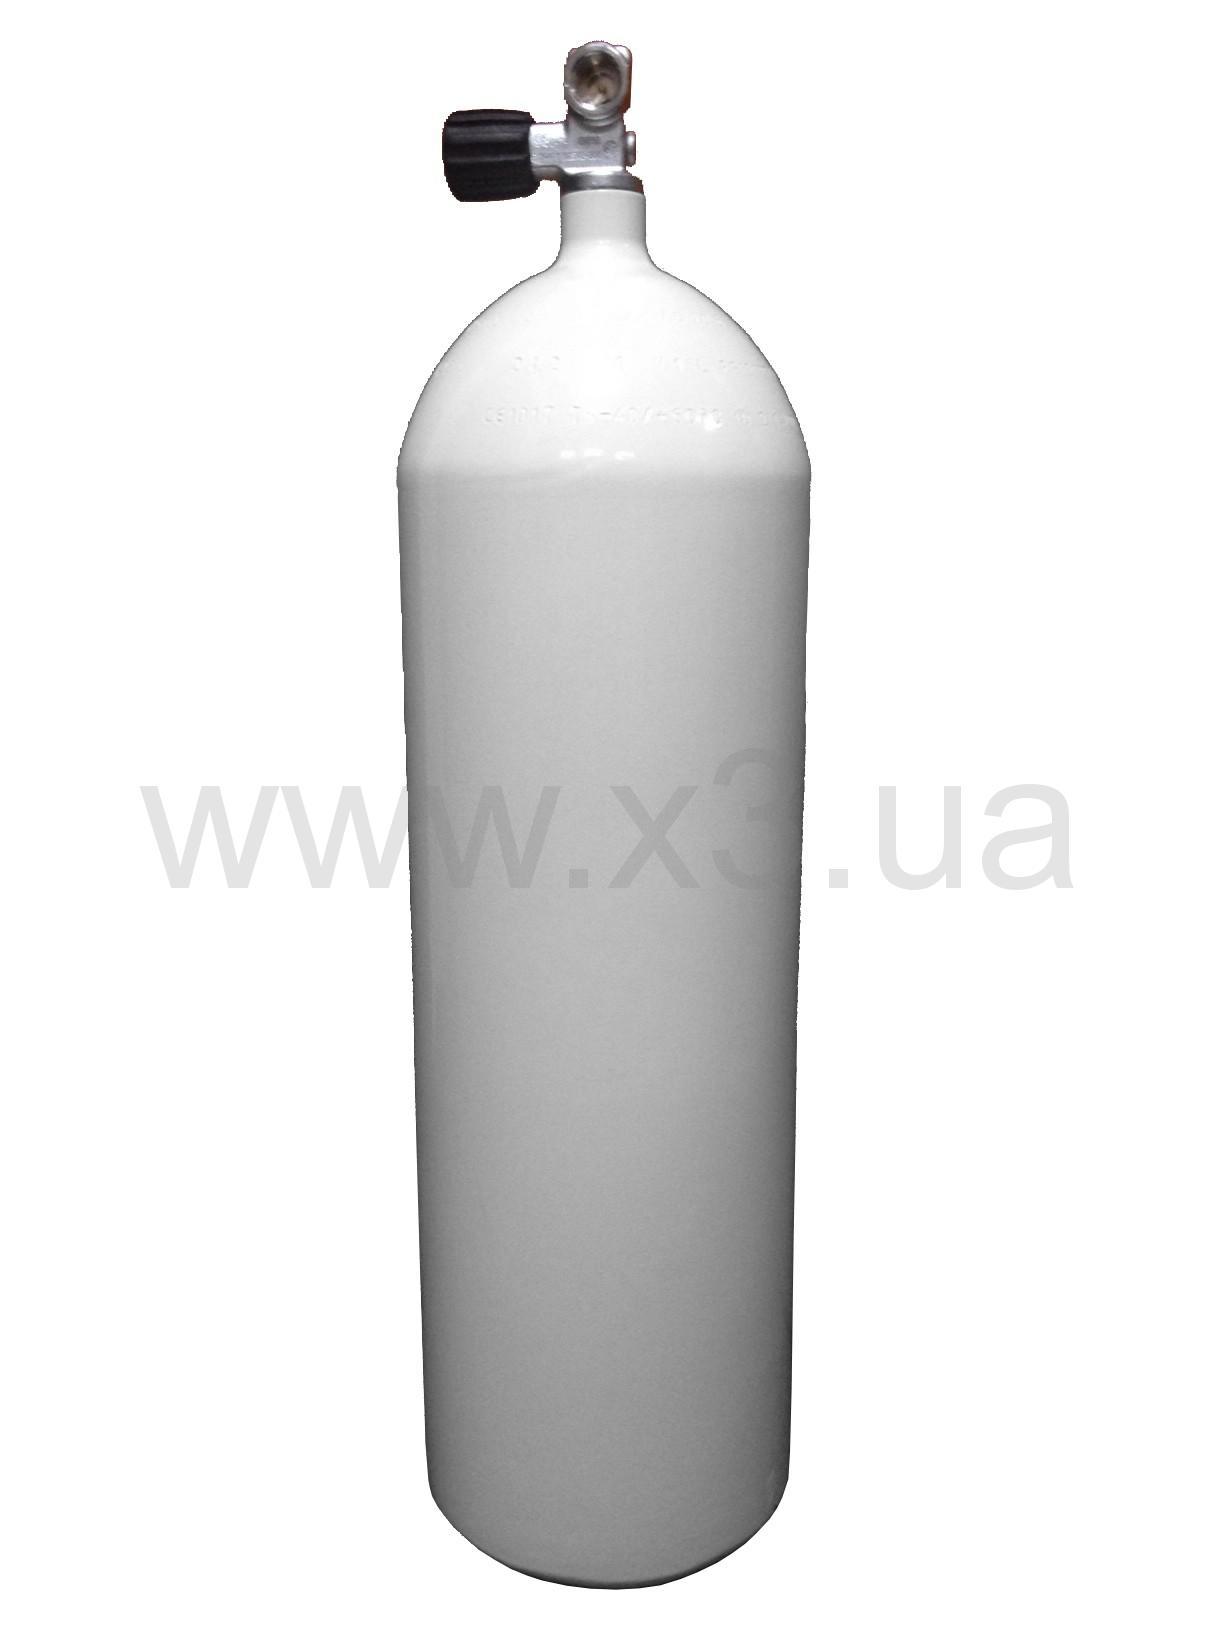 deepzone Баллон (акваланг)DEEPZONE баллон стальной 15 л, 230 Bar, 171 мм с вентилем CONCAVE